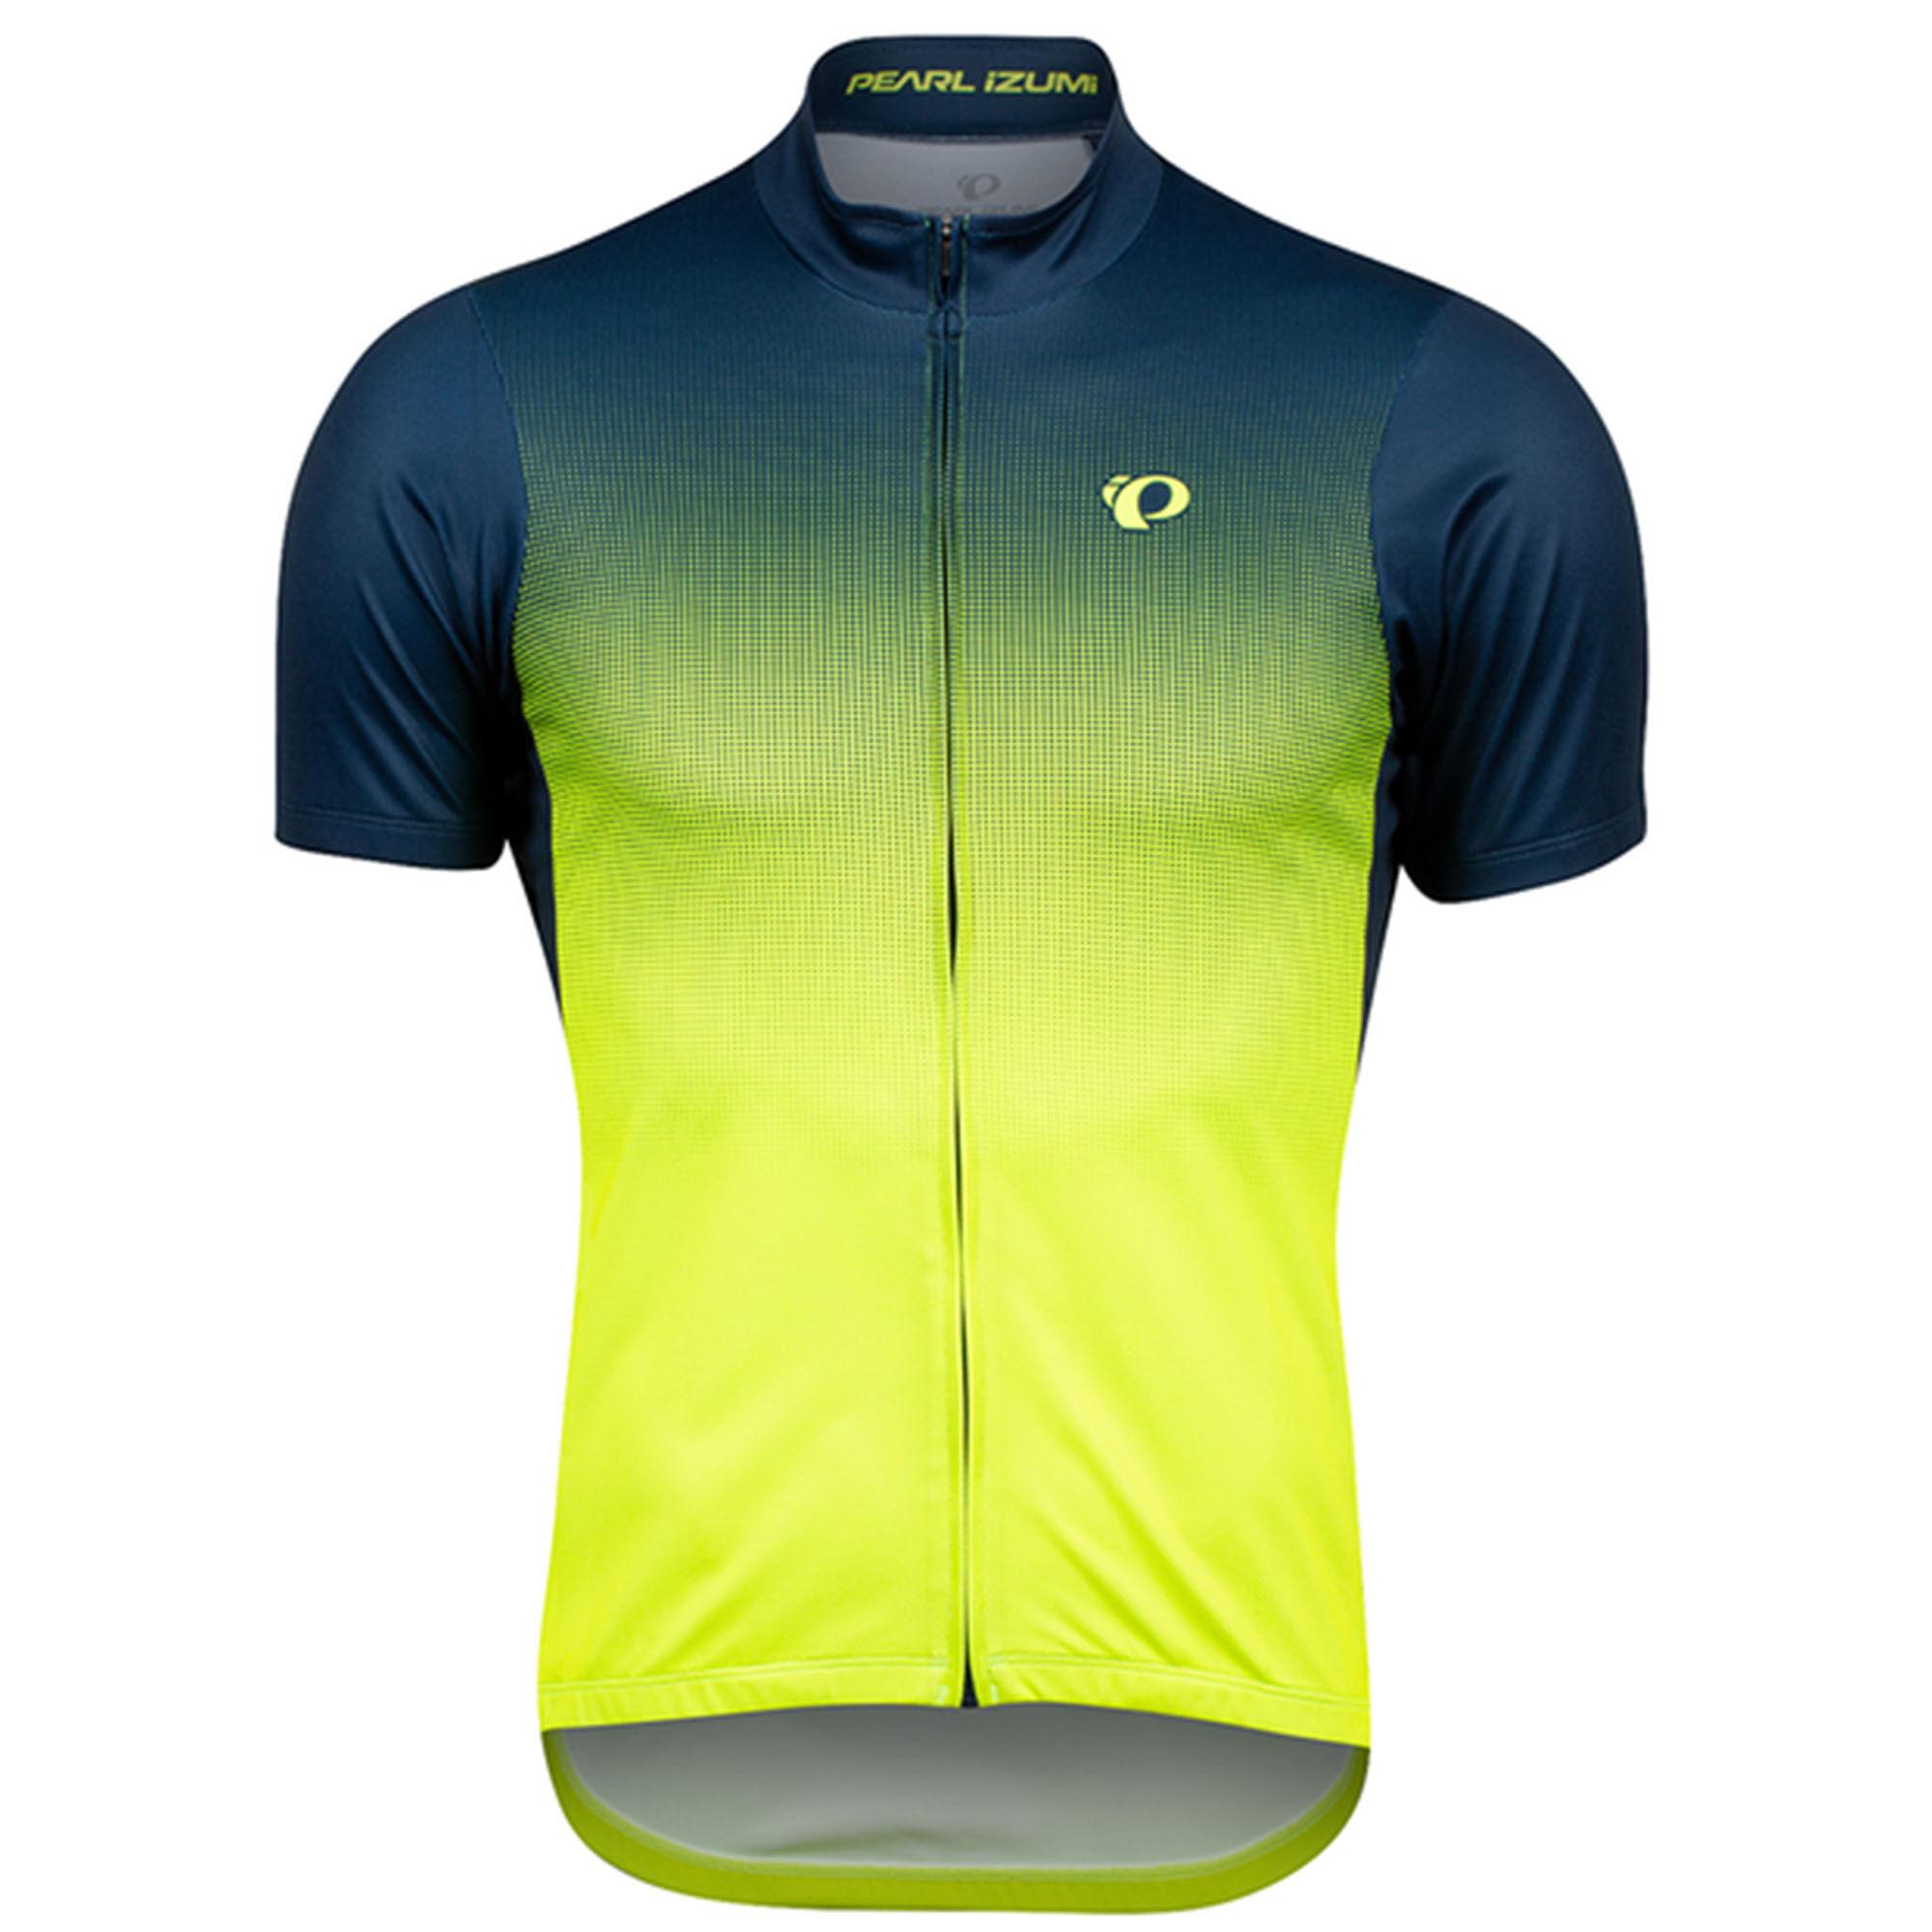 Pearl Izumi Men's Select LTD Cycling Jersey  - Navy/Yellow Transform - Size: Large